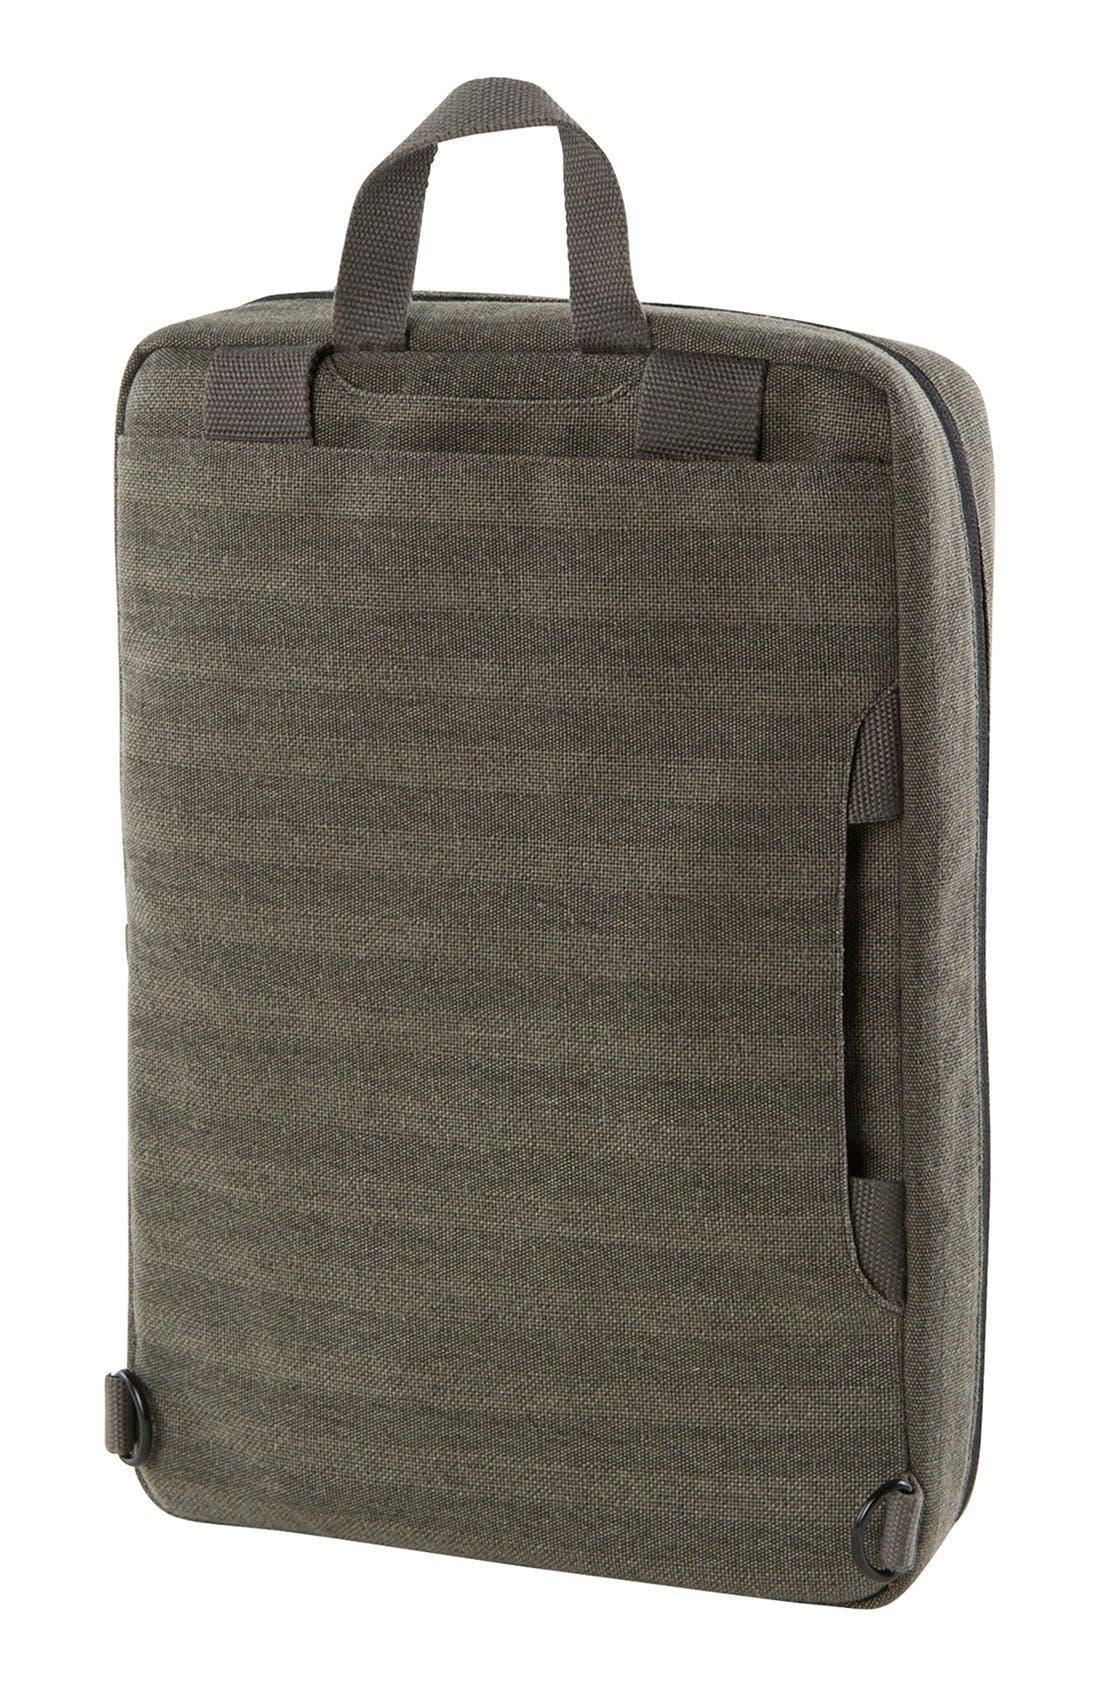 Radar Convertible Water Resistant Briefcase,                             Alternate thumbnail 11, color,